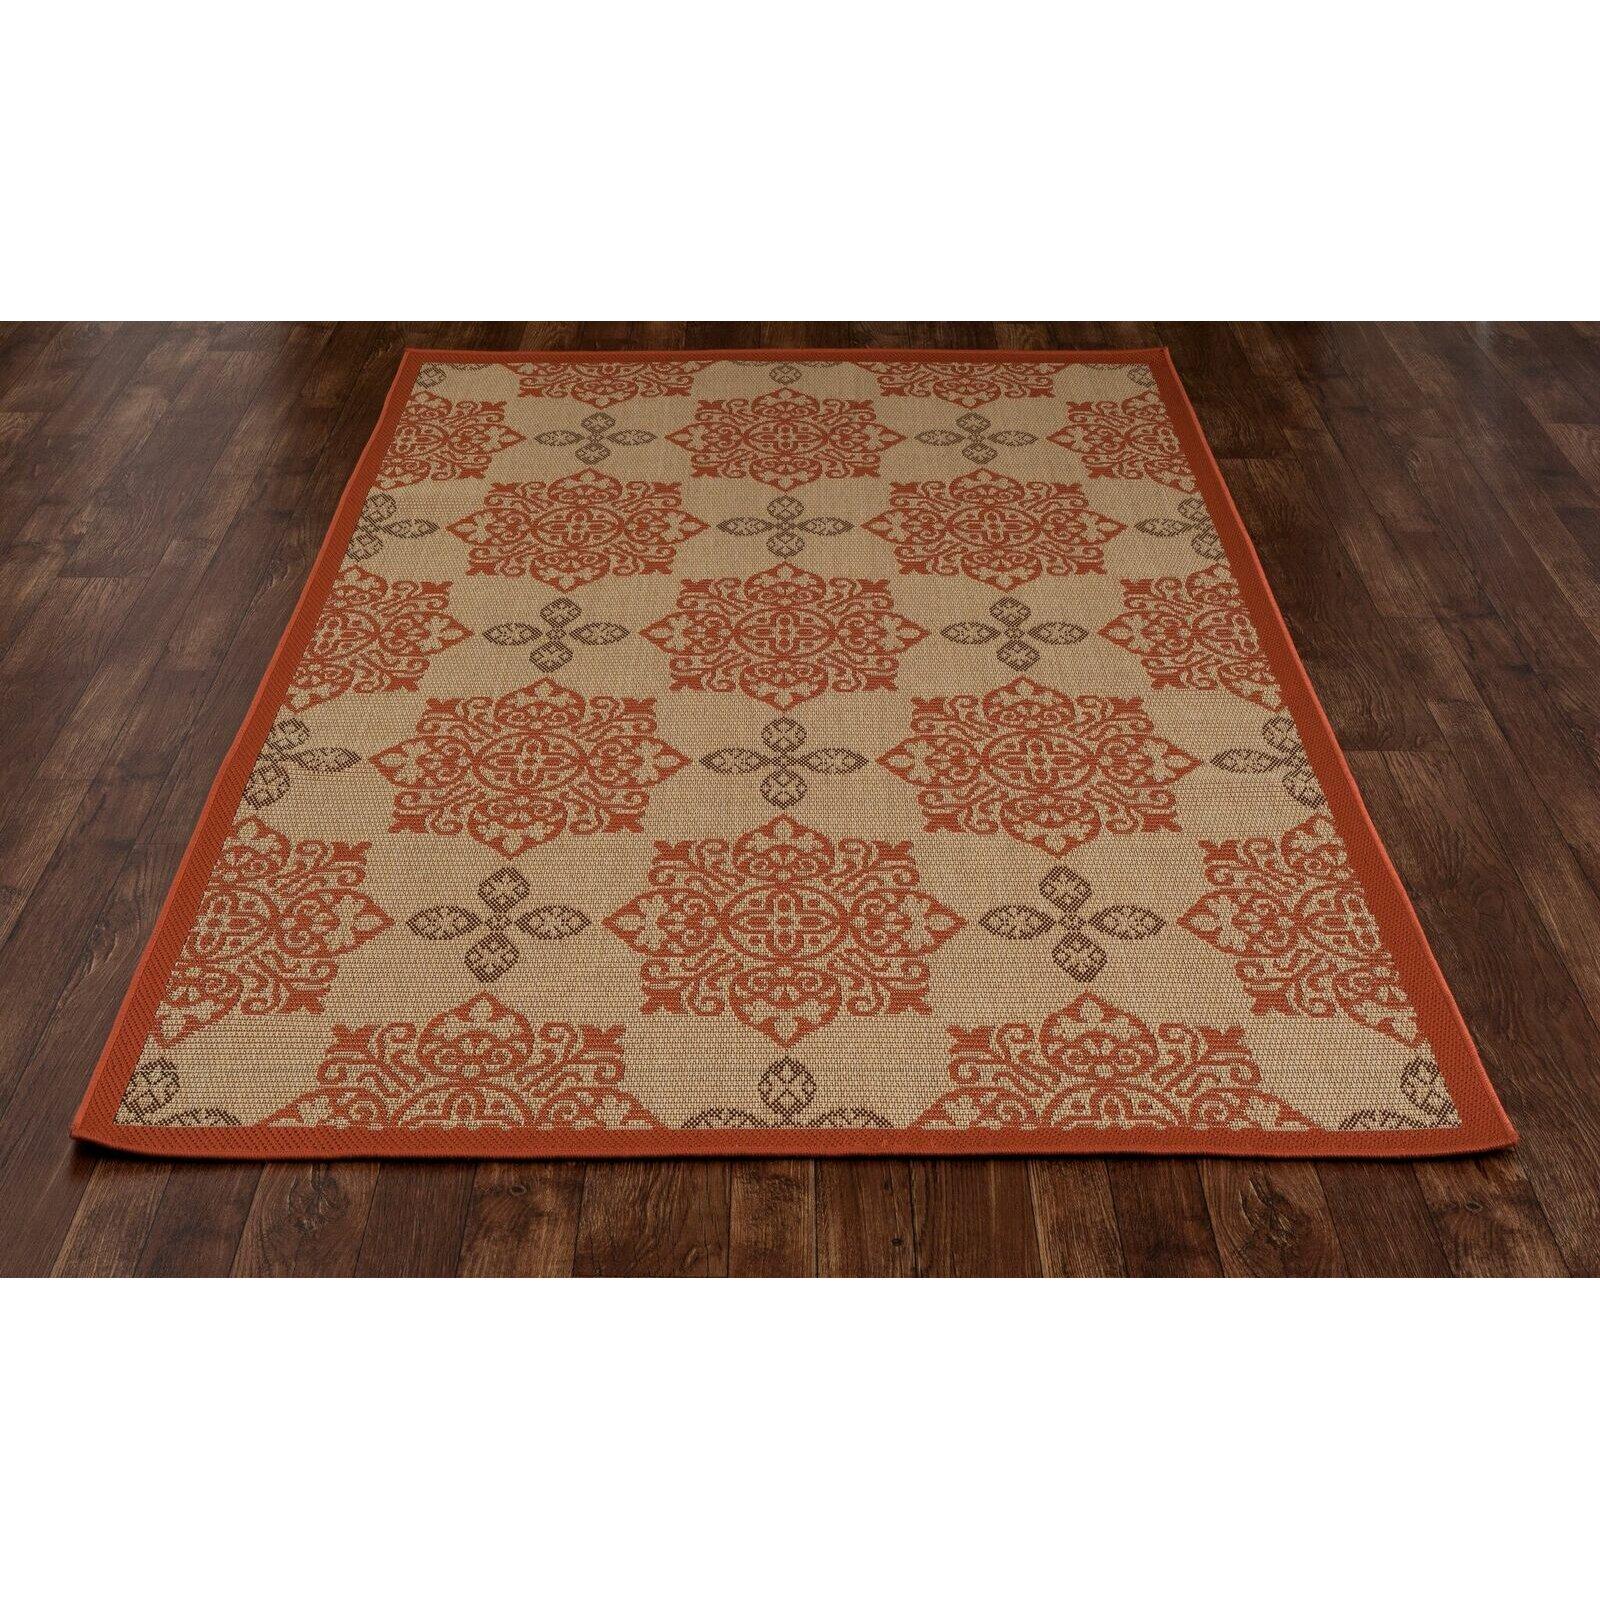 Art Carpet Plymouth Tan Indoor Outdoor Area Rug & Reviews